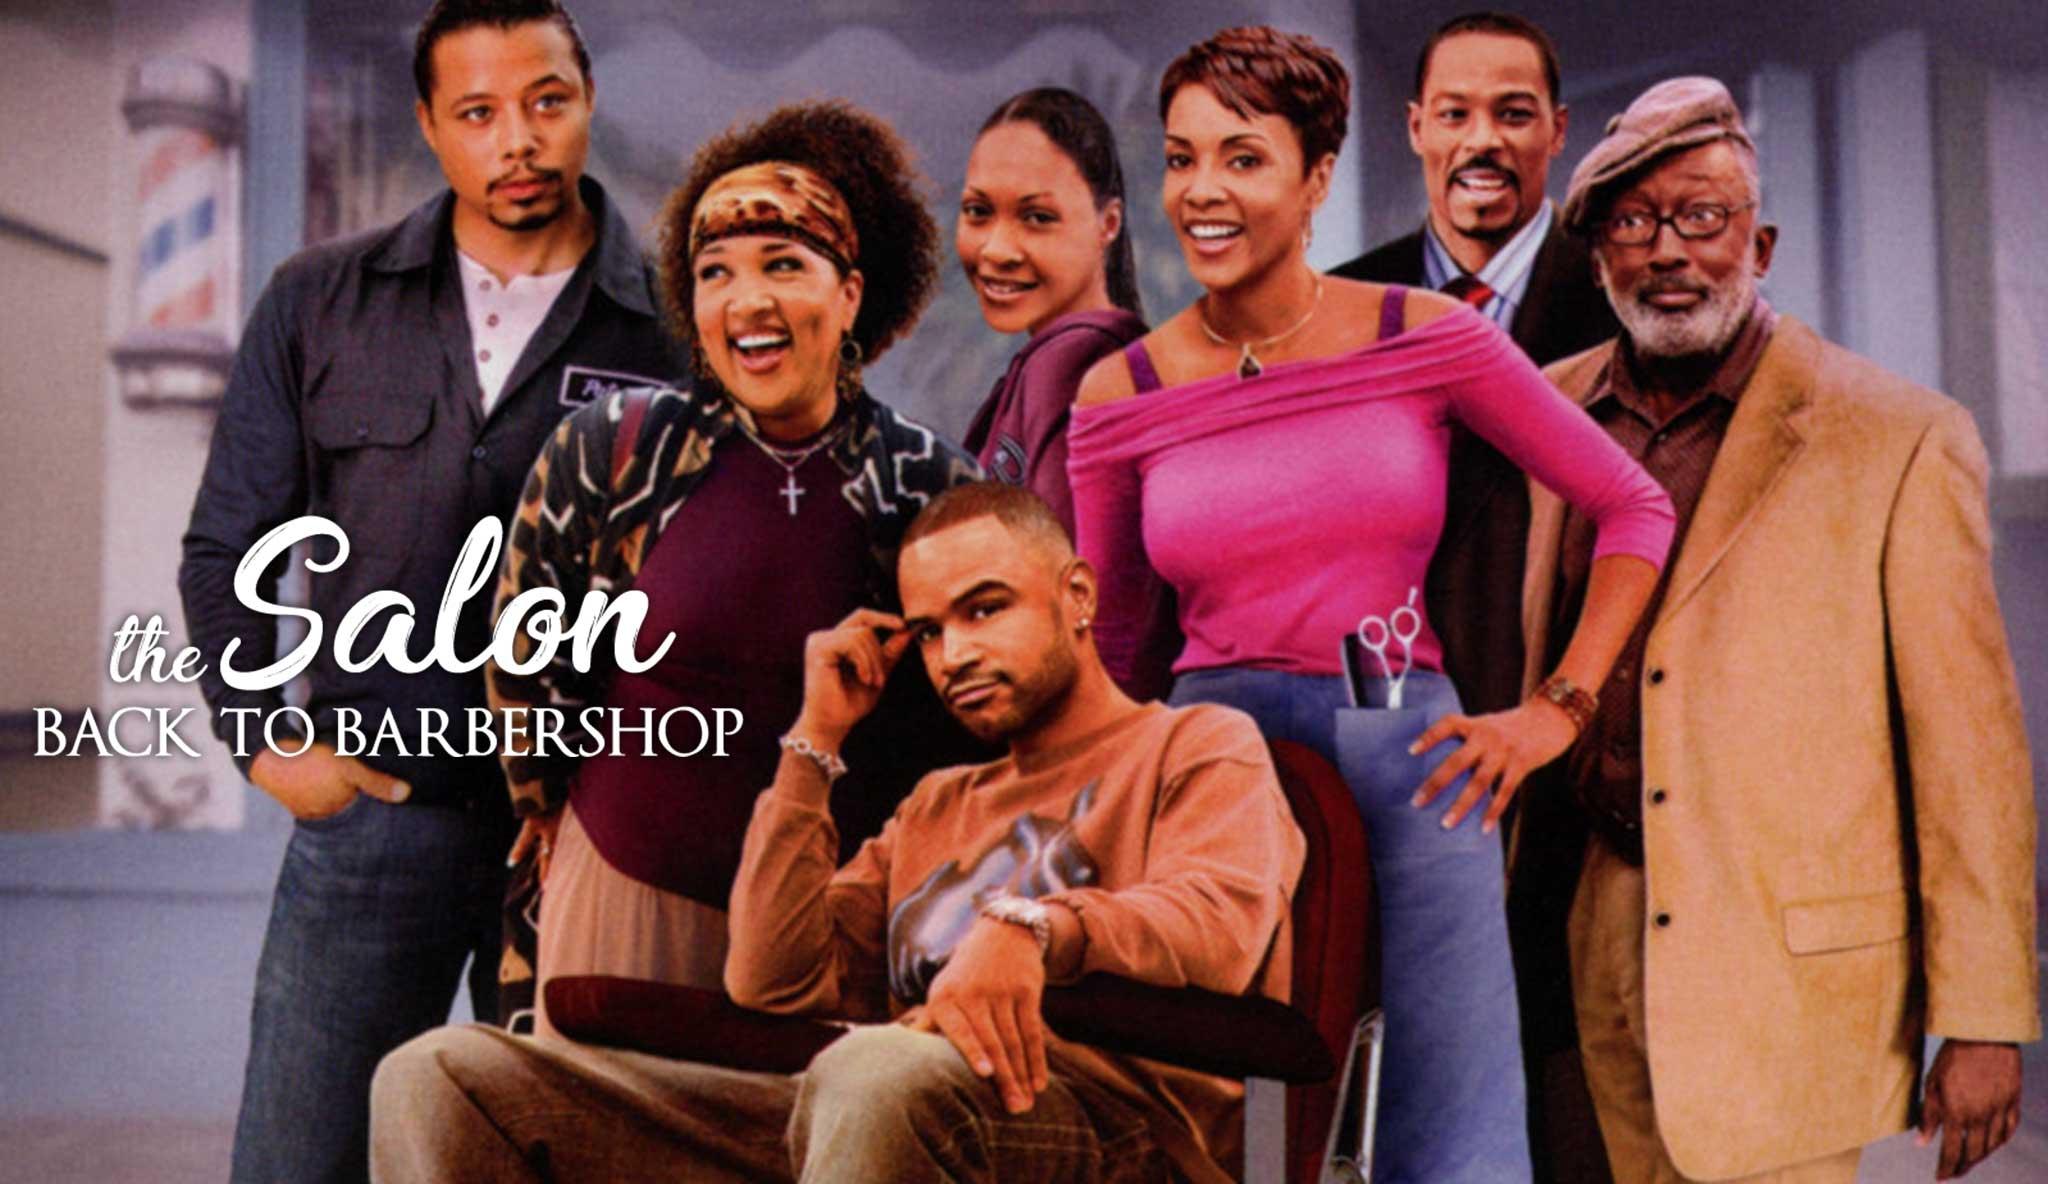 barbershop-back-to-the-salon-2\header.jpg